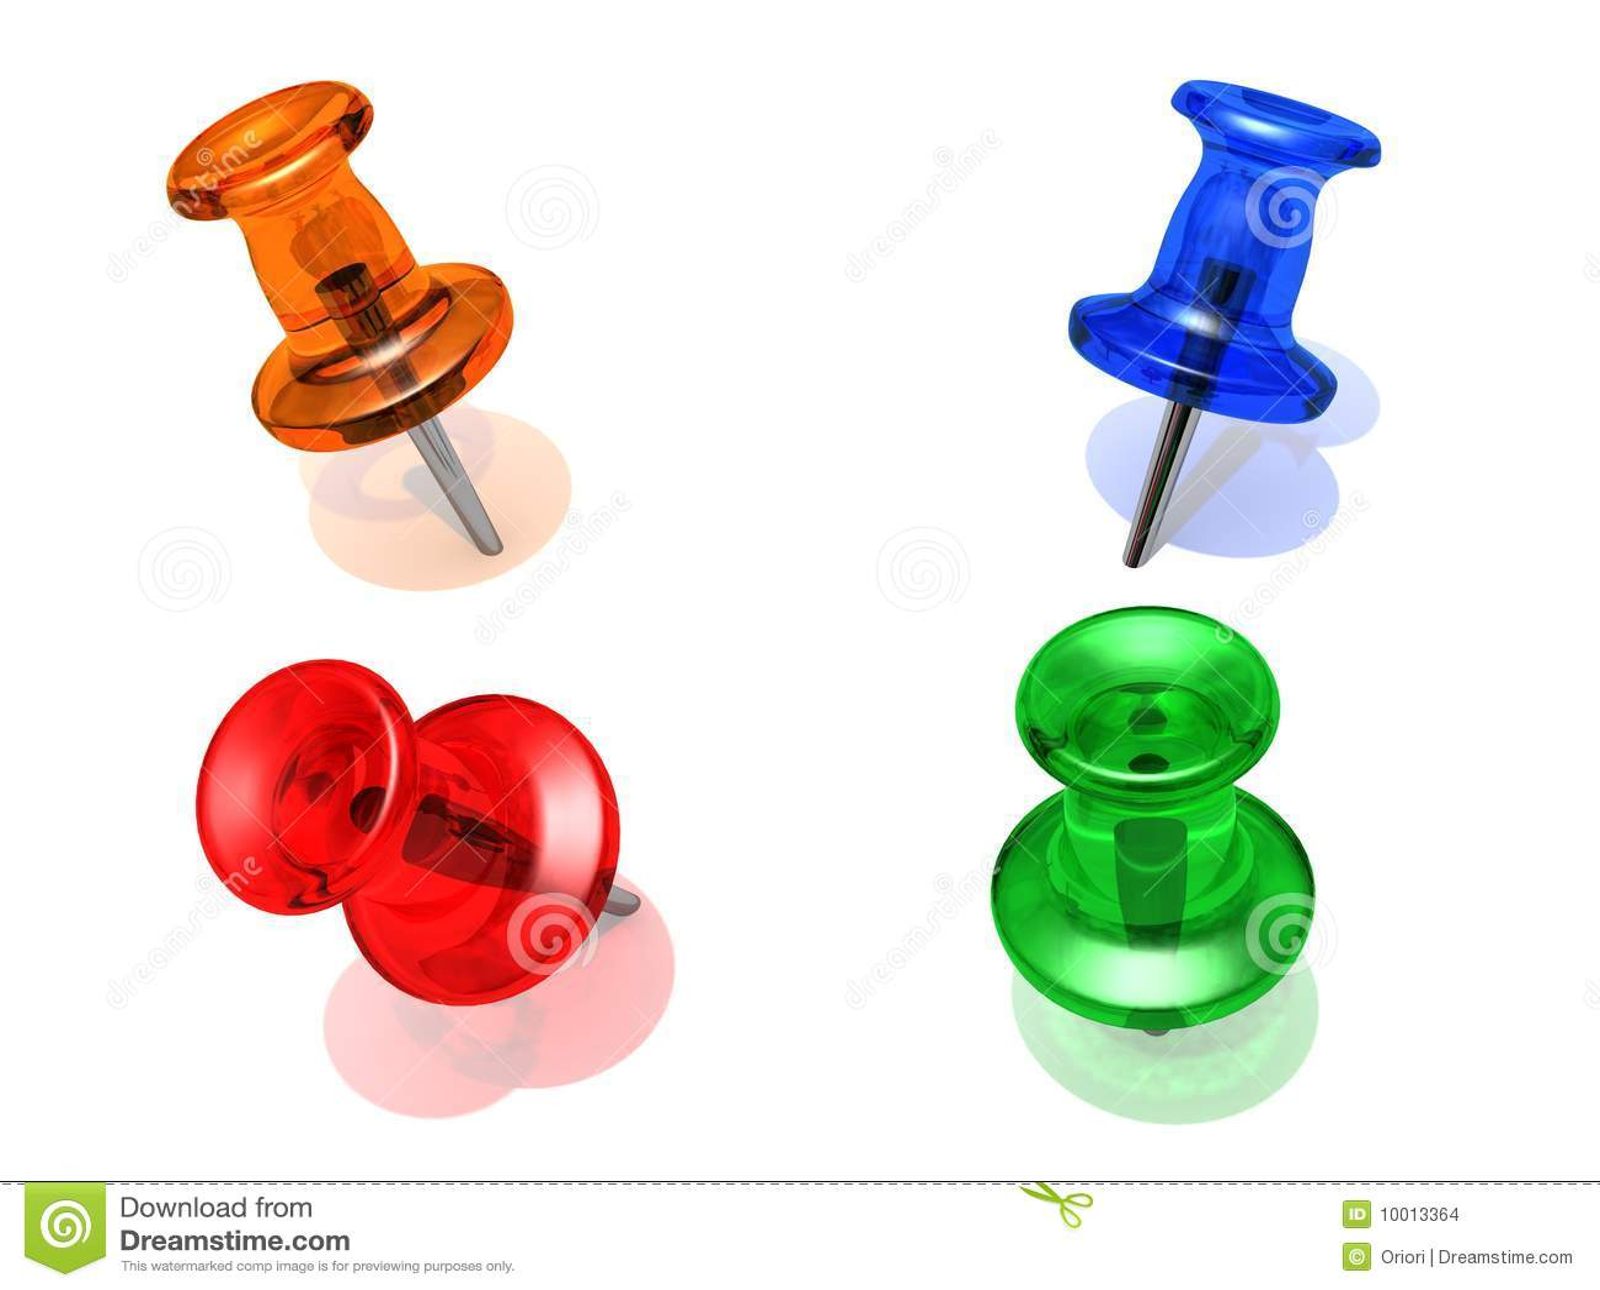 hard-enamel-colors-pin - Enamel Pins